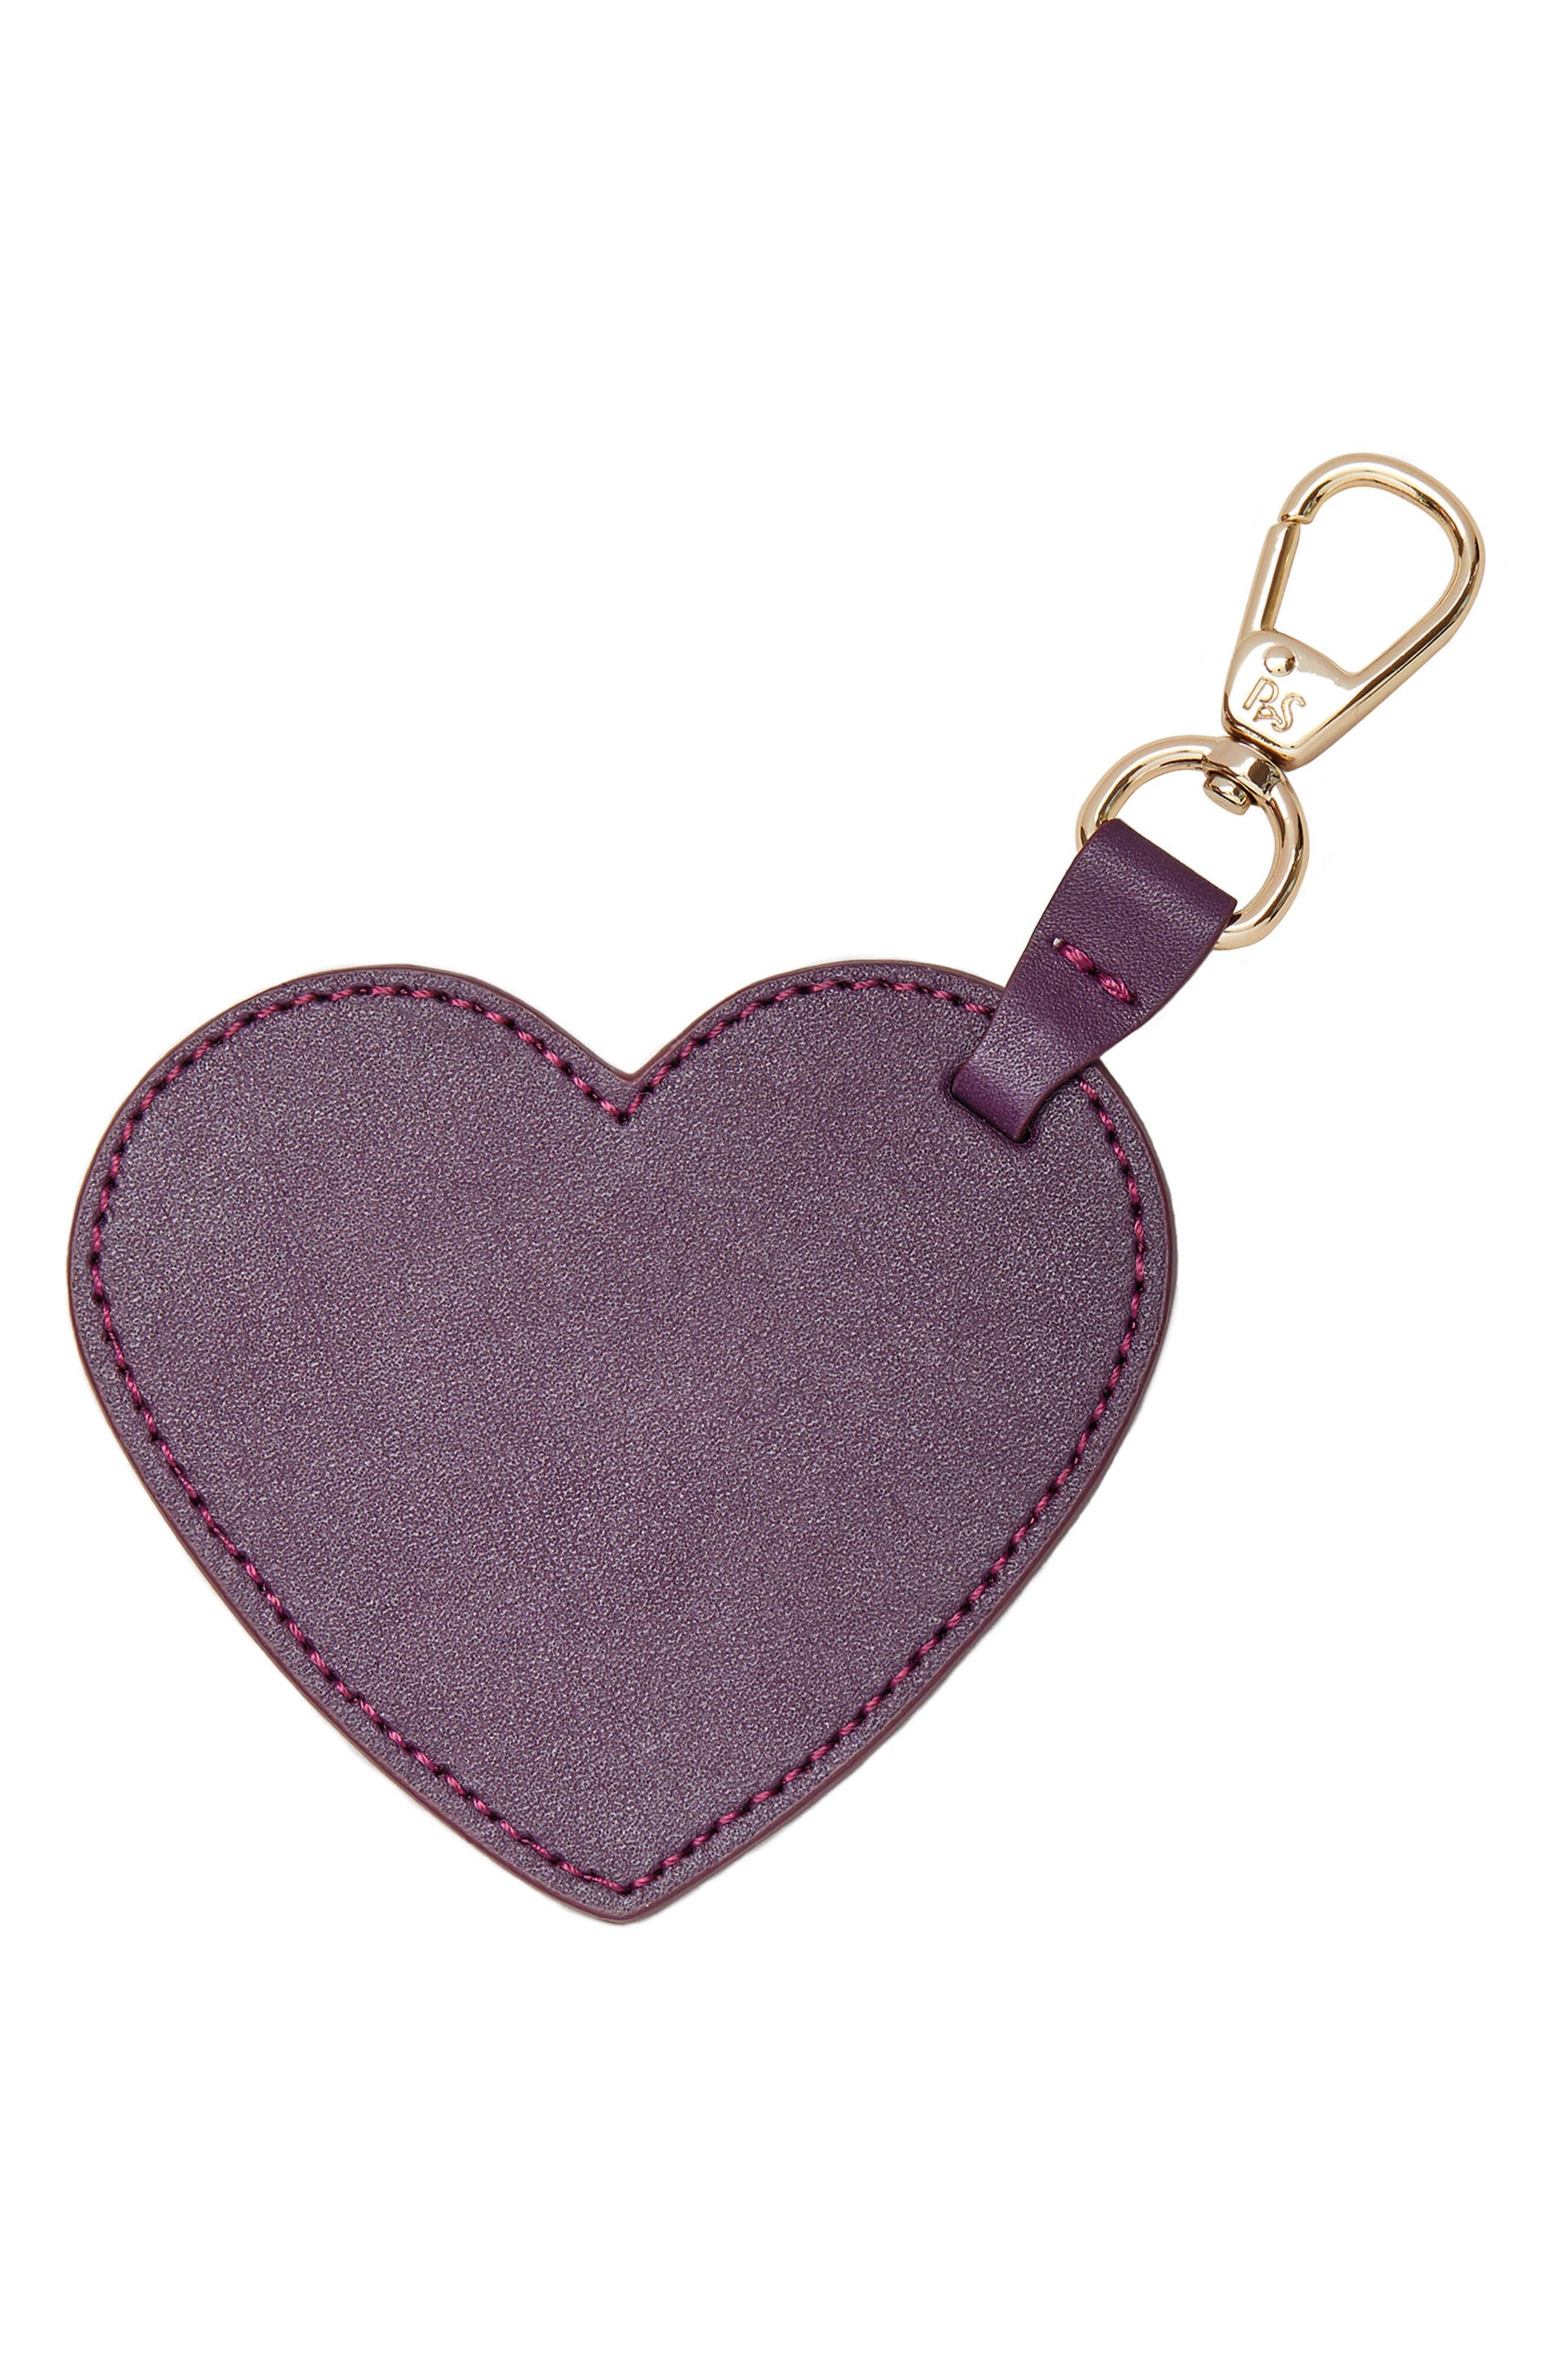 Pop & Suki Smaller Heart Bag Charm (Nordstrom Exclusive)